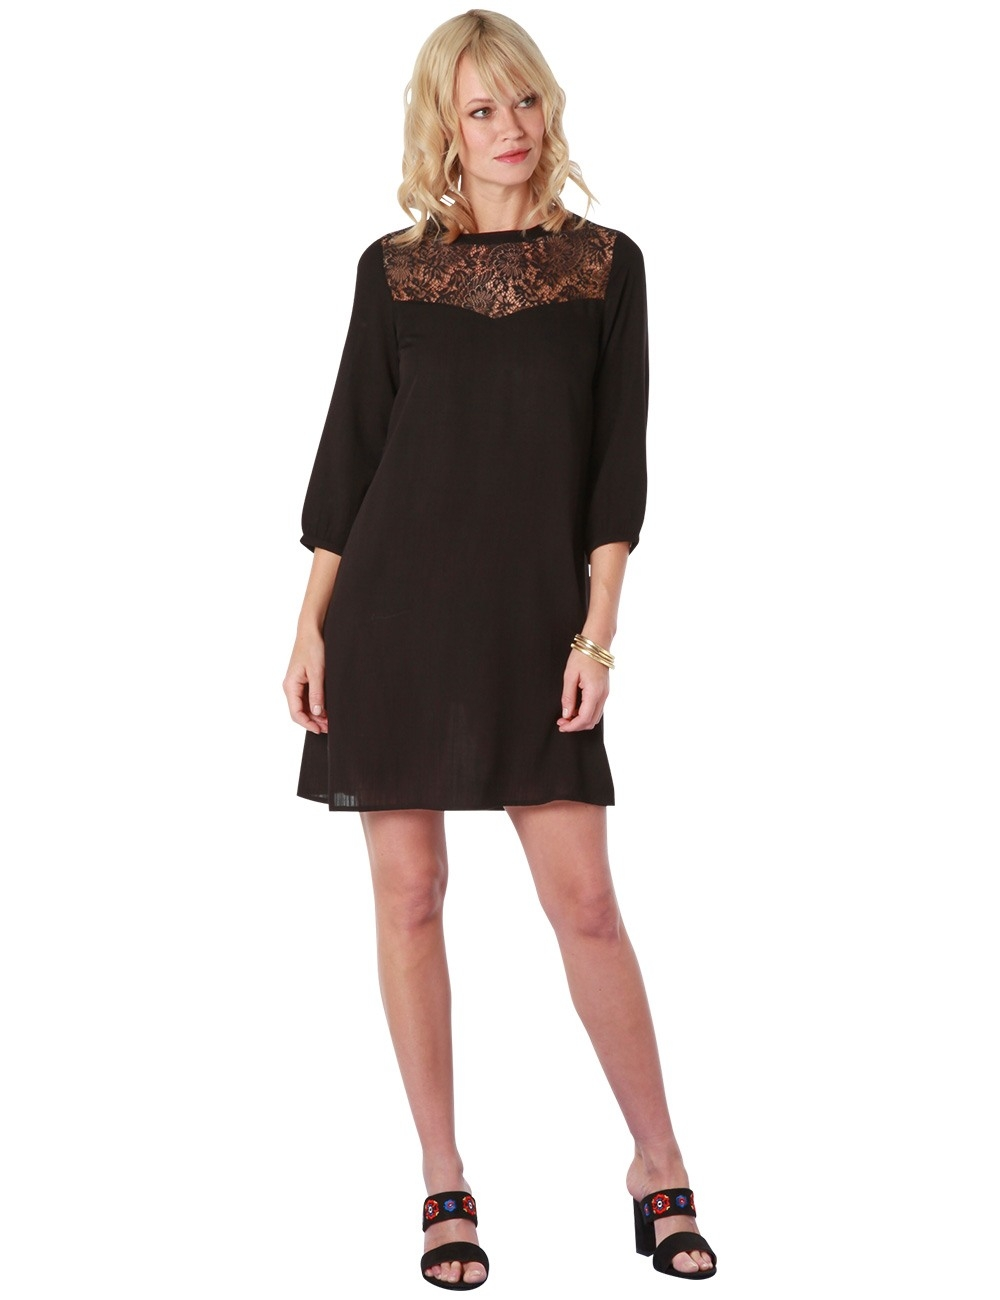 20 Genial Schwarzes Kleid Spitze Ärmel15 Einzigartig Schwarzes Kleid Spitze Bester Preis